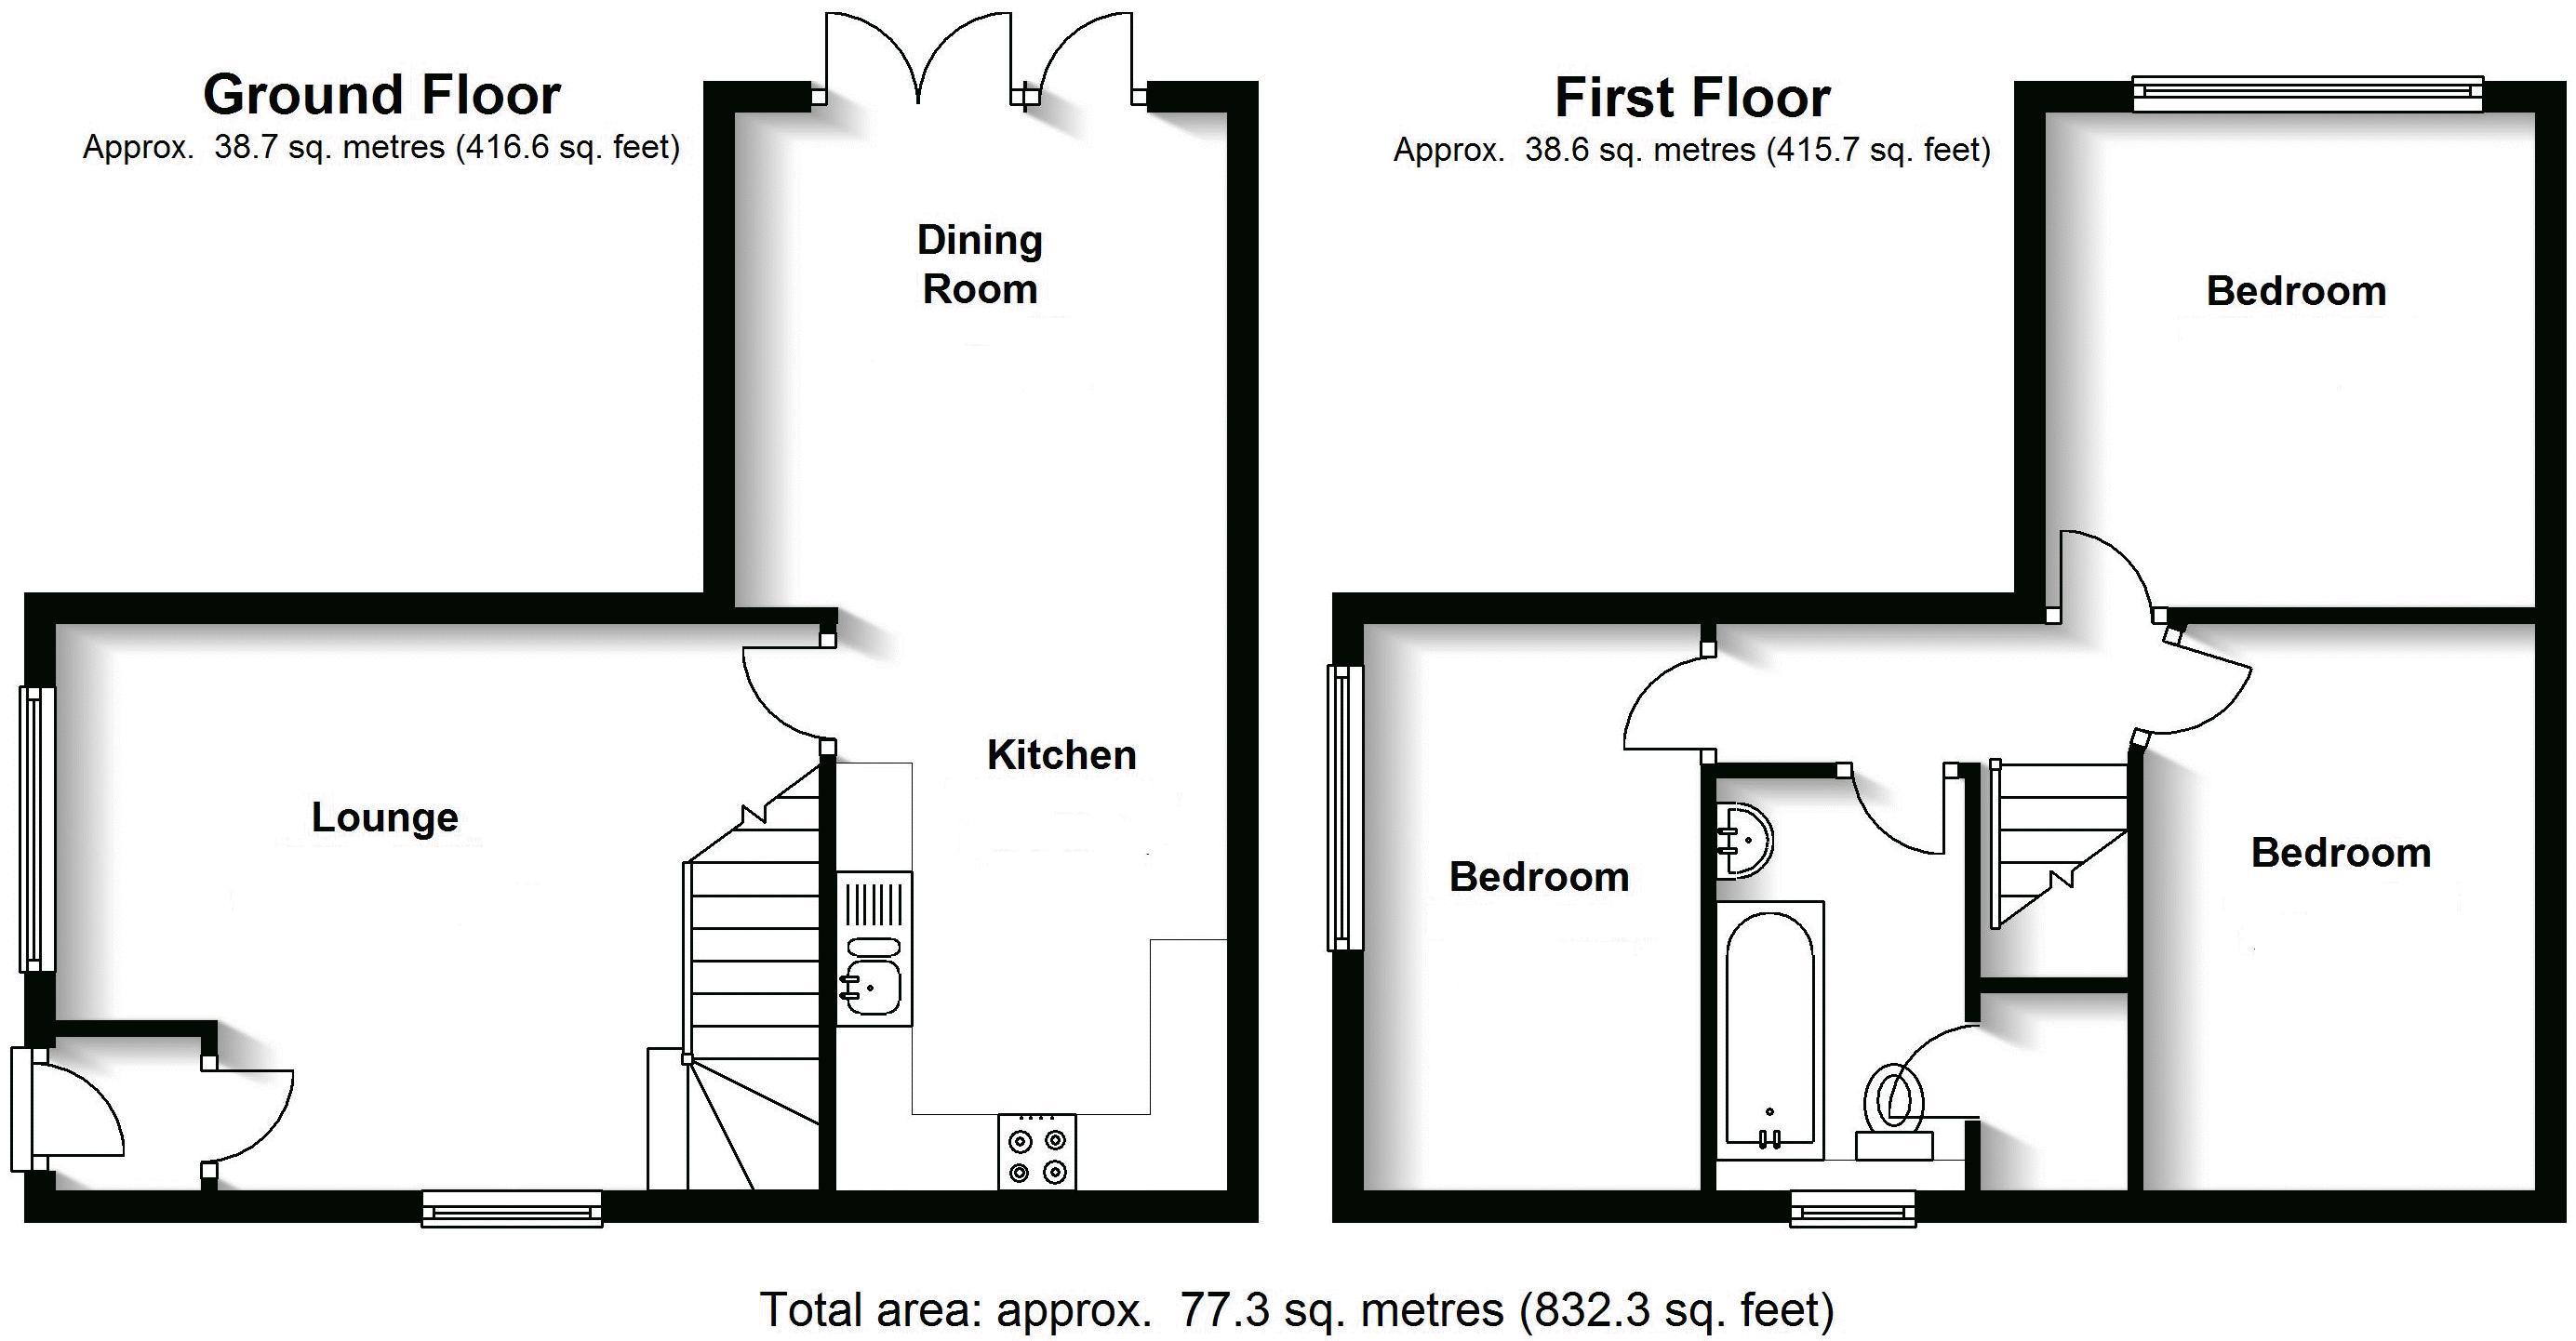 Yew Tree Close, Lapworth. Floorplan. 30 Yew Tree Close Floorplan.